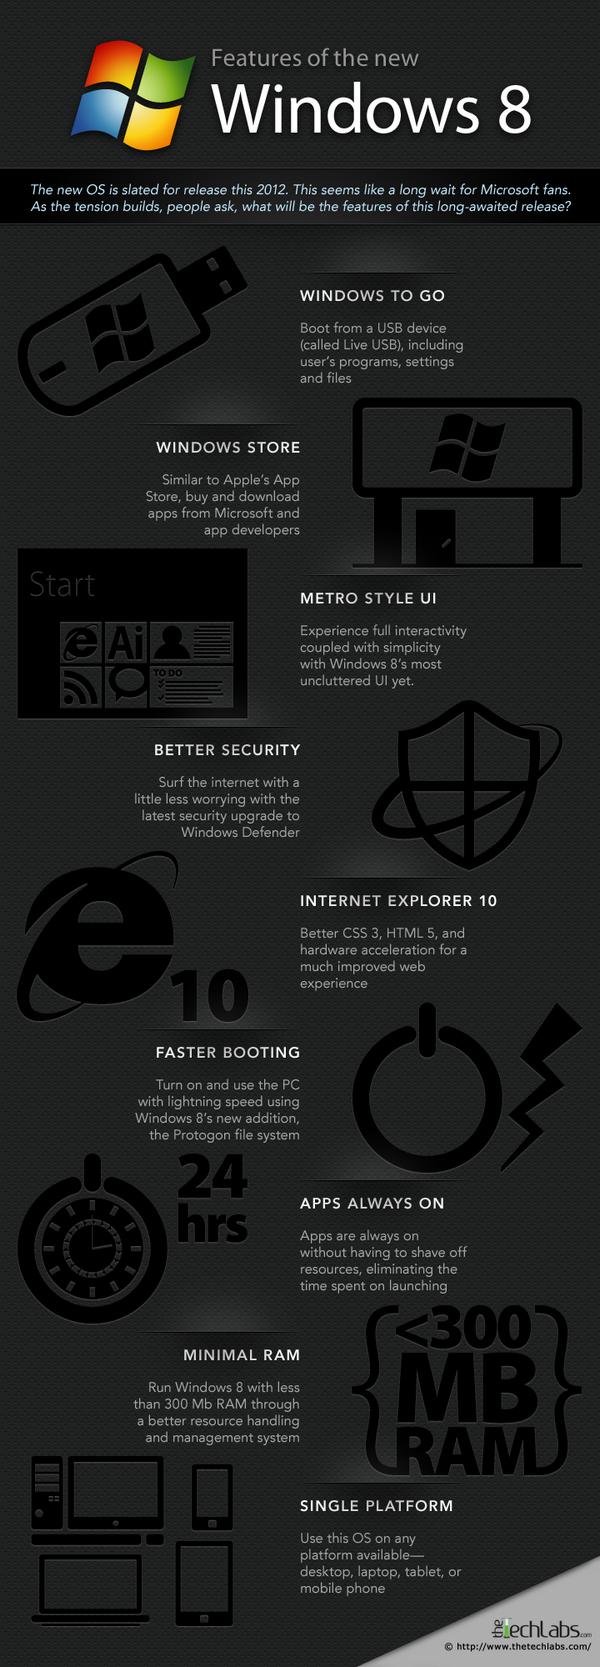 Windows 8 Features